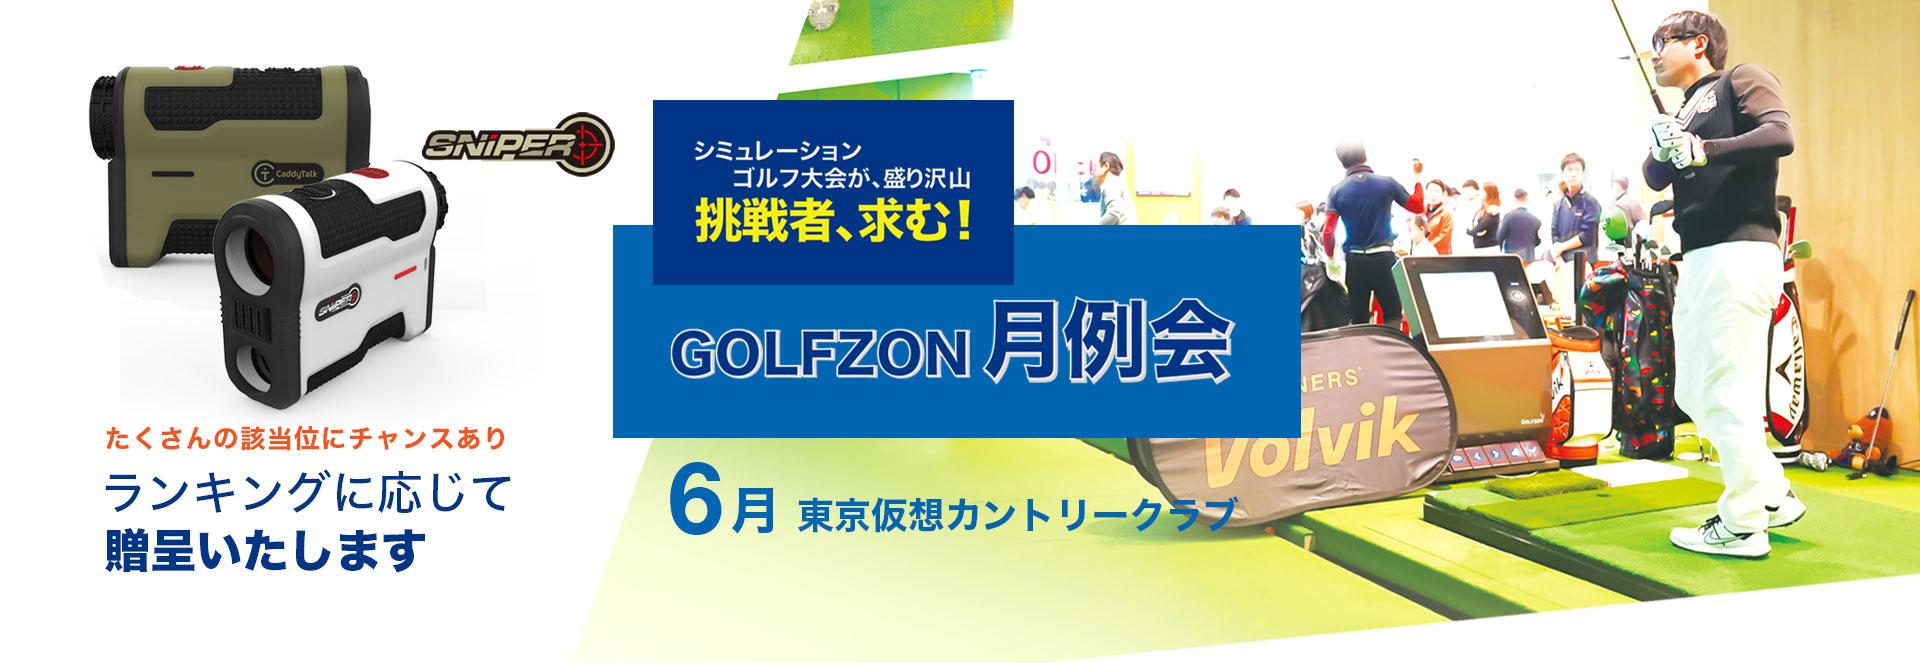 GOLFZON月例会/6月大会・結果